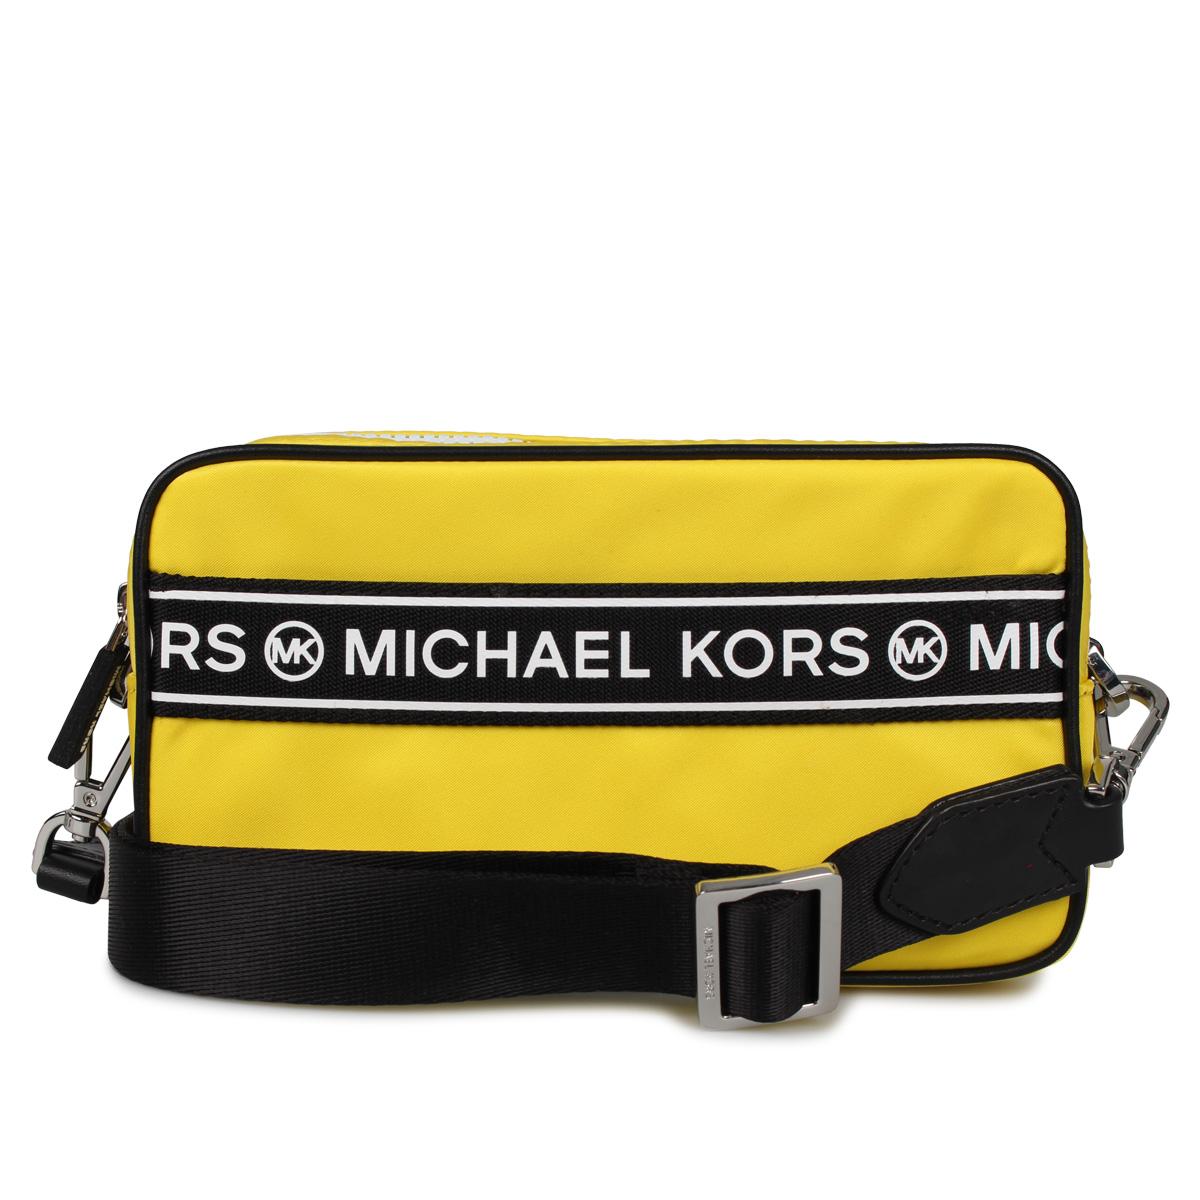 MICHAEL KORS KENLY SM CAMERA XBODY マイケルコース バッグ ショルダーバッグ レディース イエロー 35H9SY9C5C [4/20 新入荷]